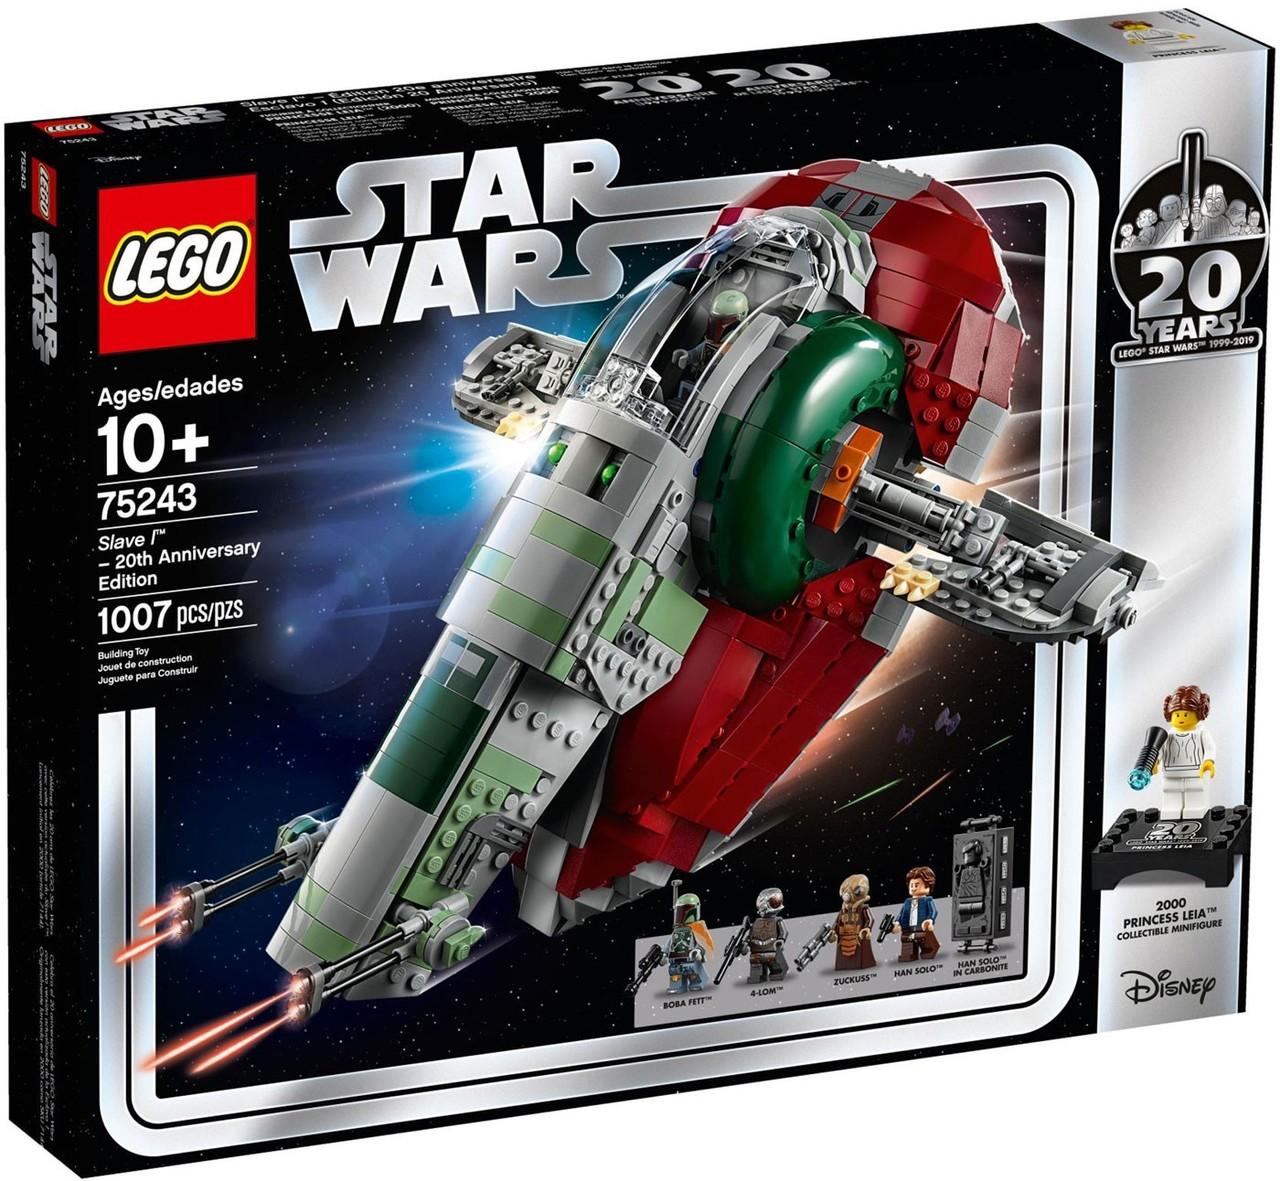 LEGO STAR WARS Boba Fett MINIFIG new from Lego set #75243